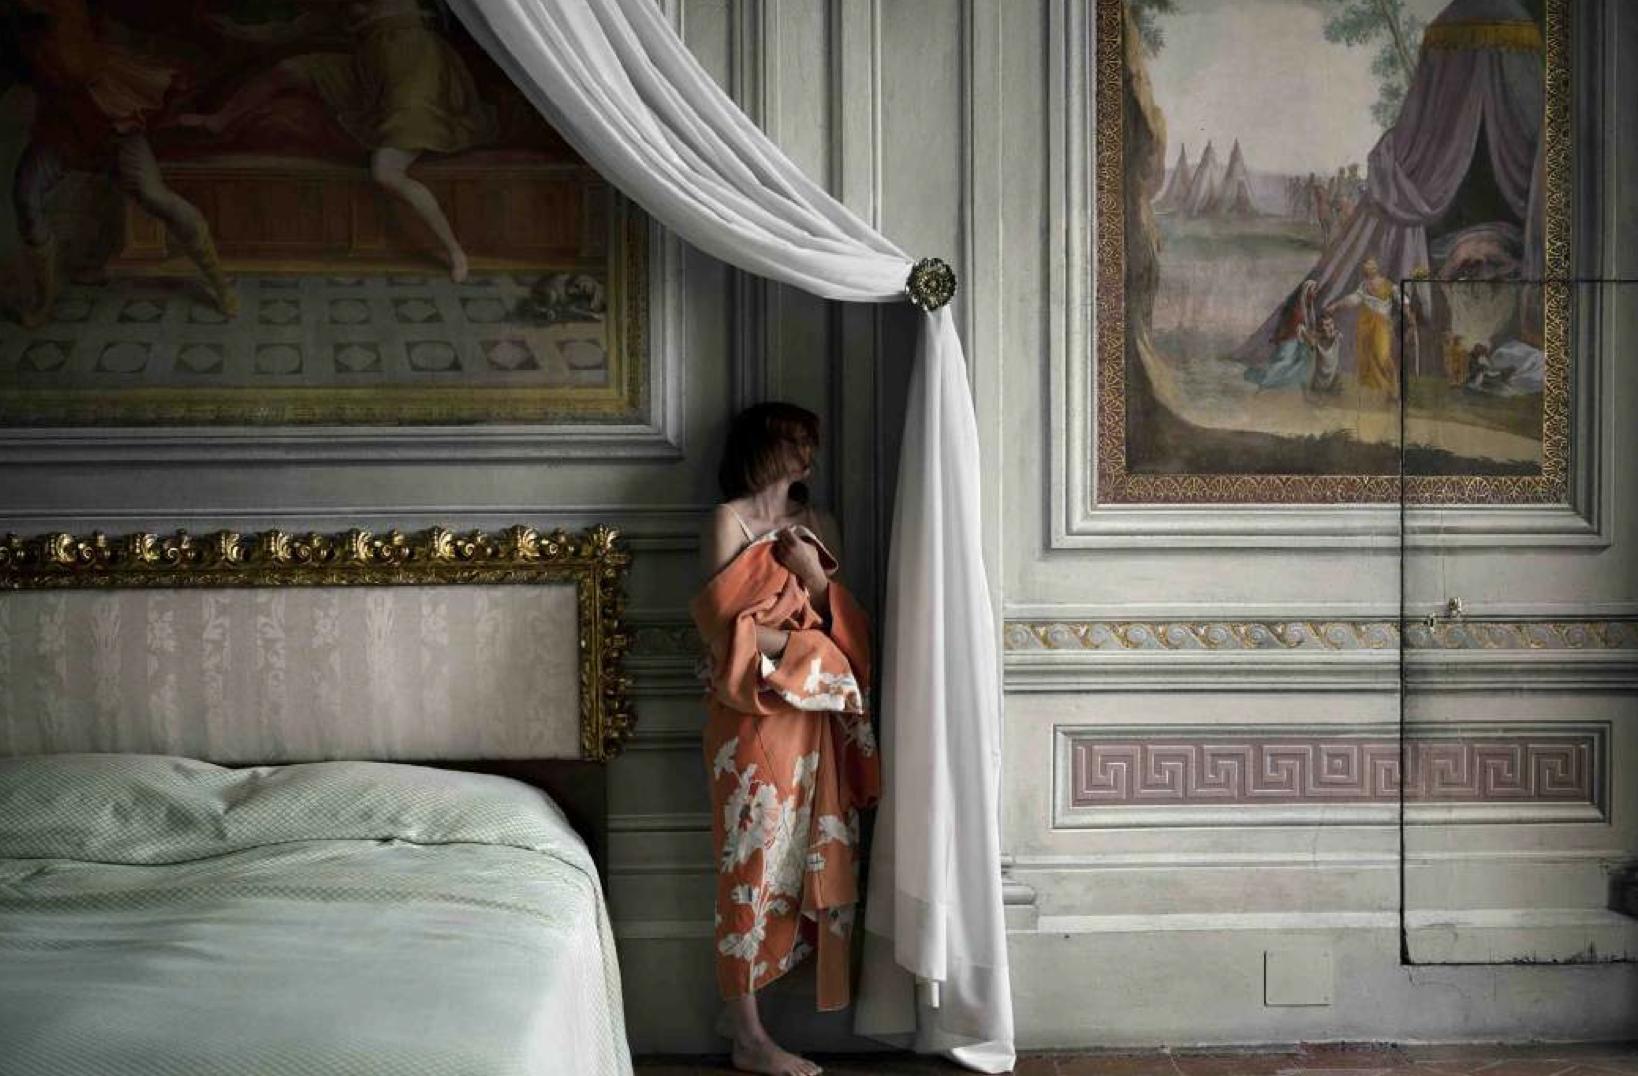 The Bedroom © Anja Niemi, The Little Black Gallery